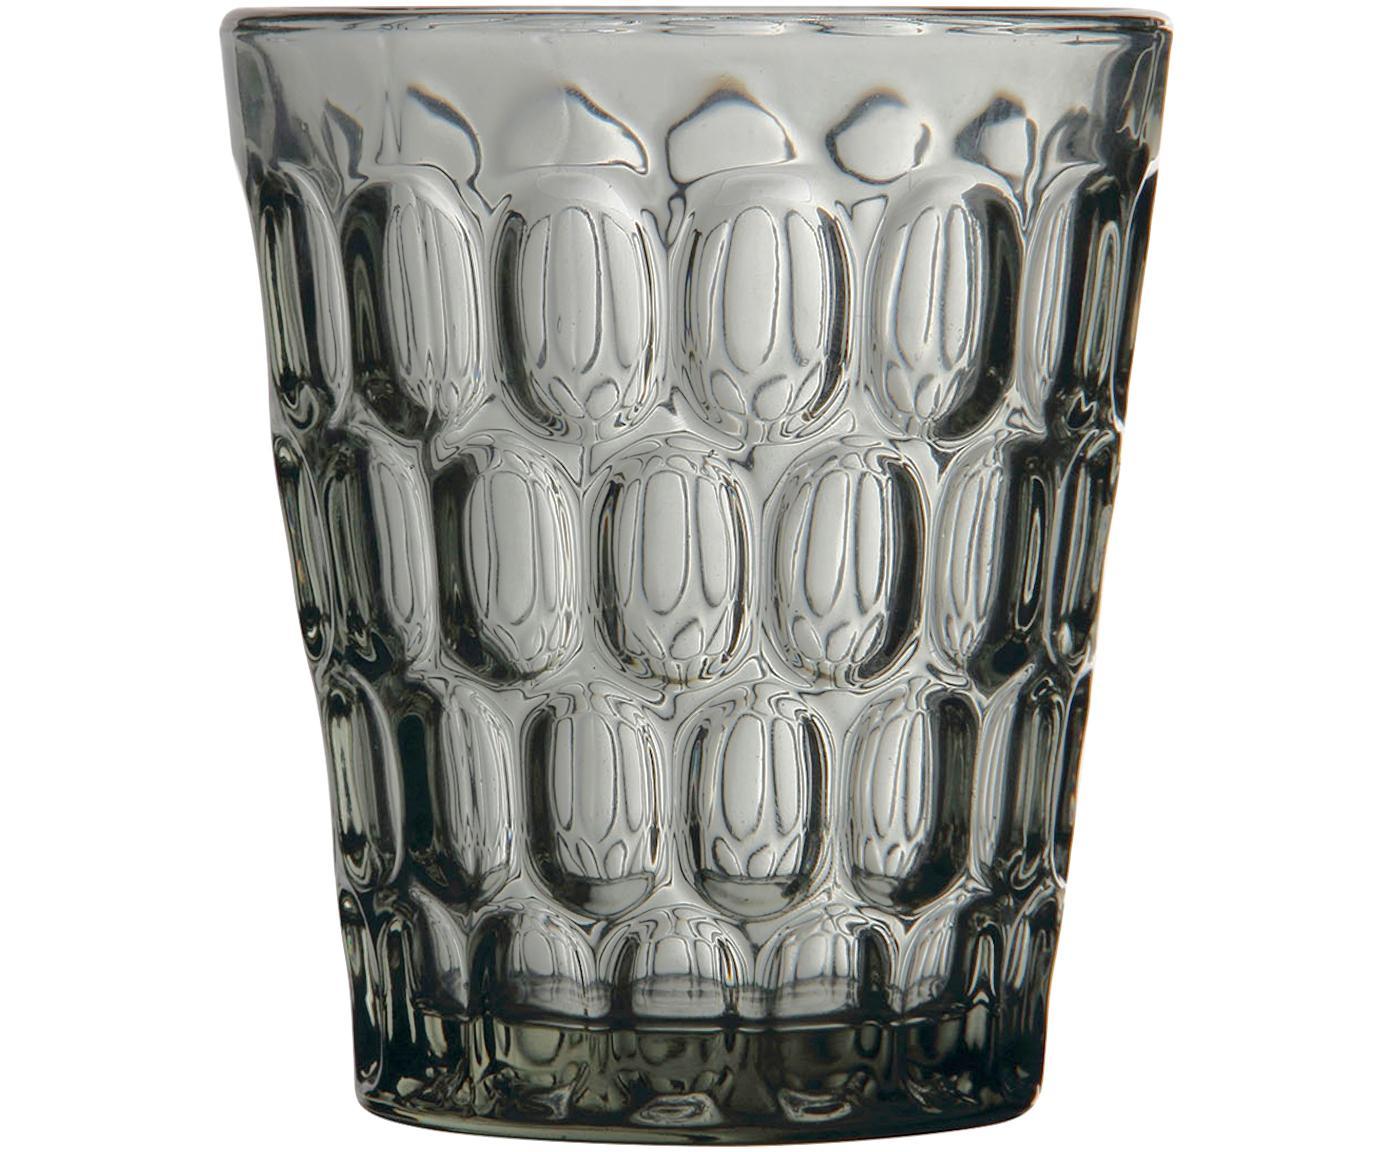 Bicchiere acqua con rilievo Optic 6 pz, Vetro, Trasparente, grigio, Ø 9 x Alt. 11 cm